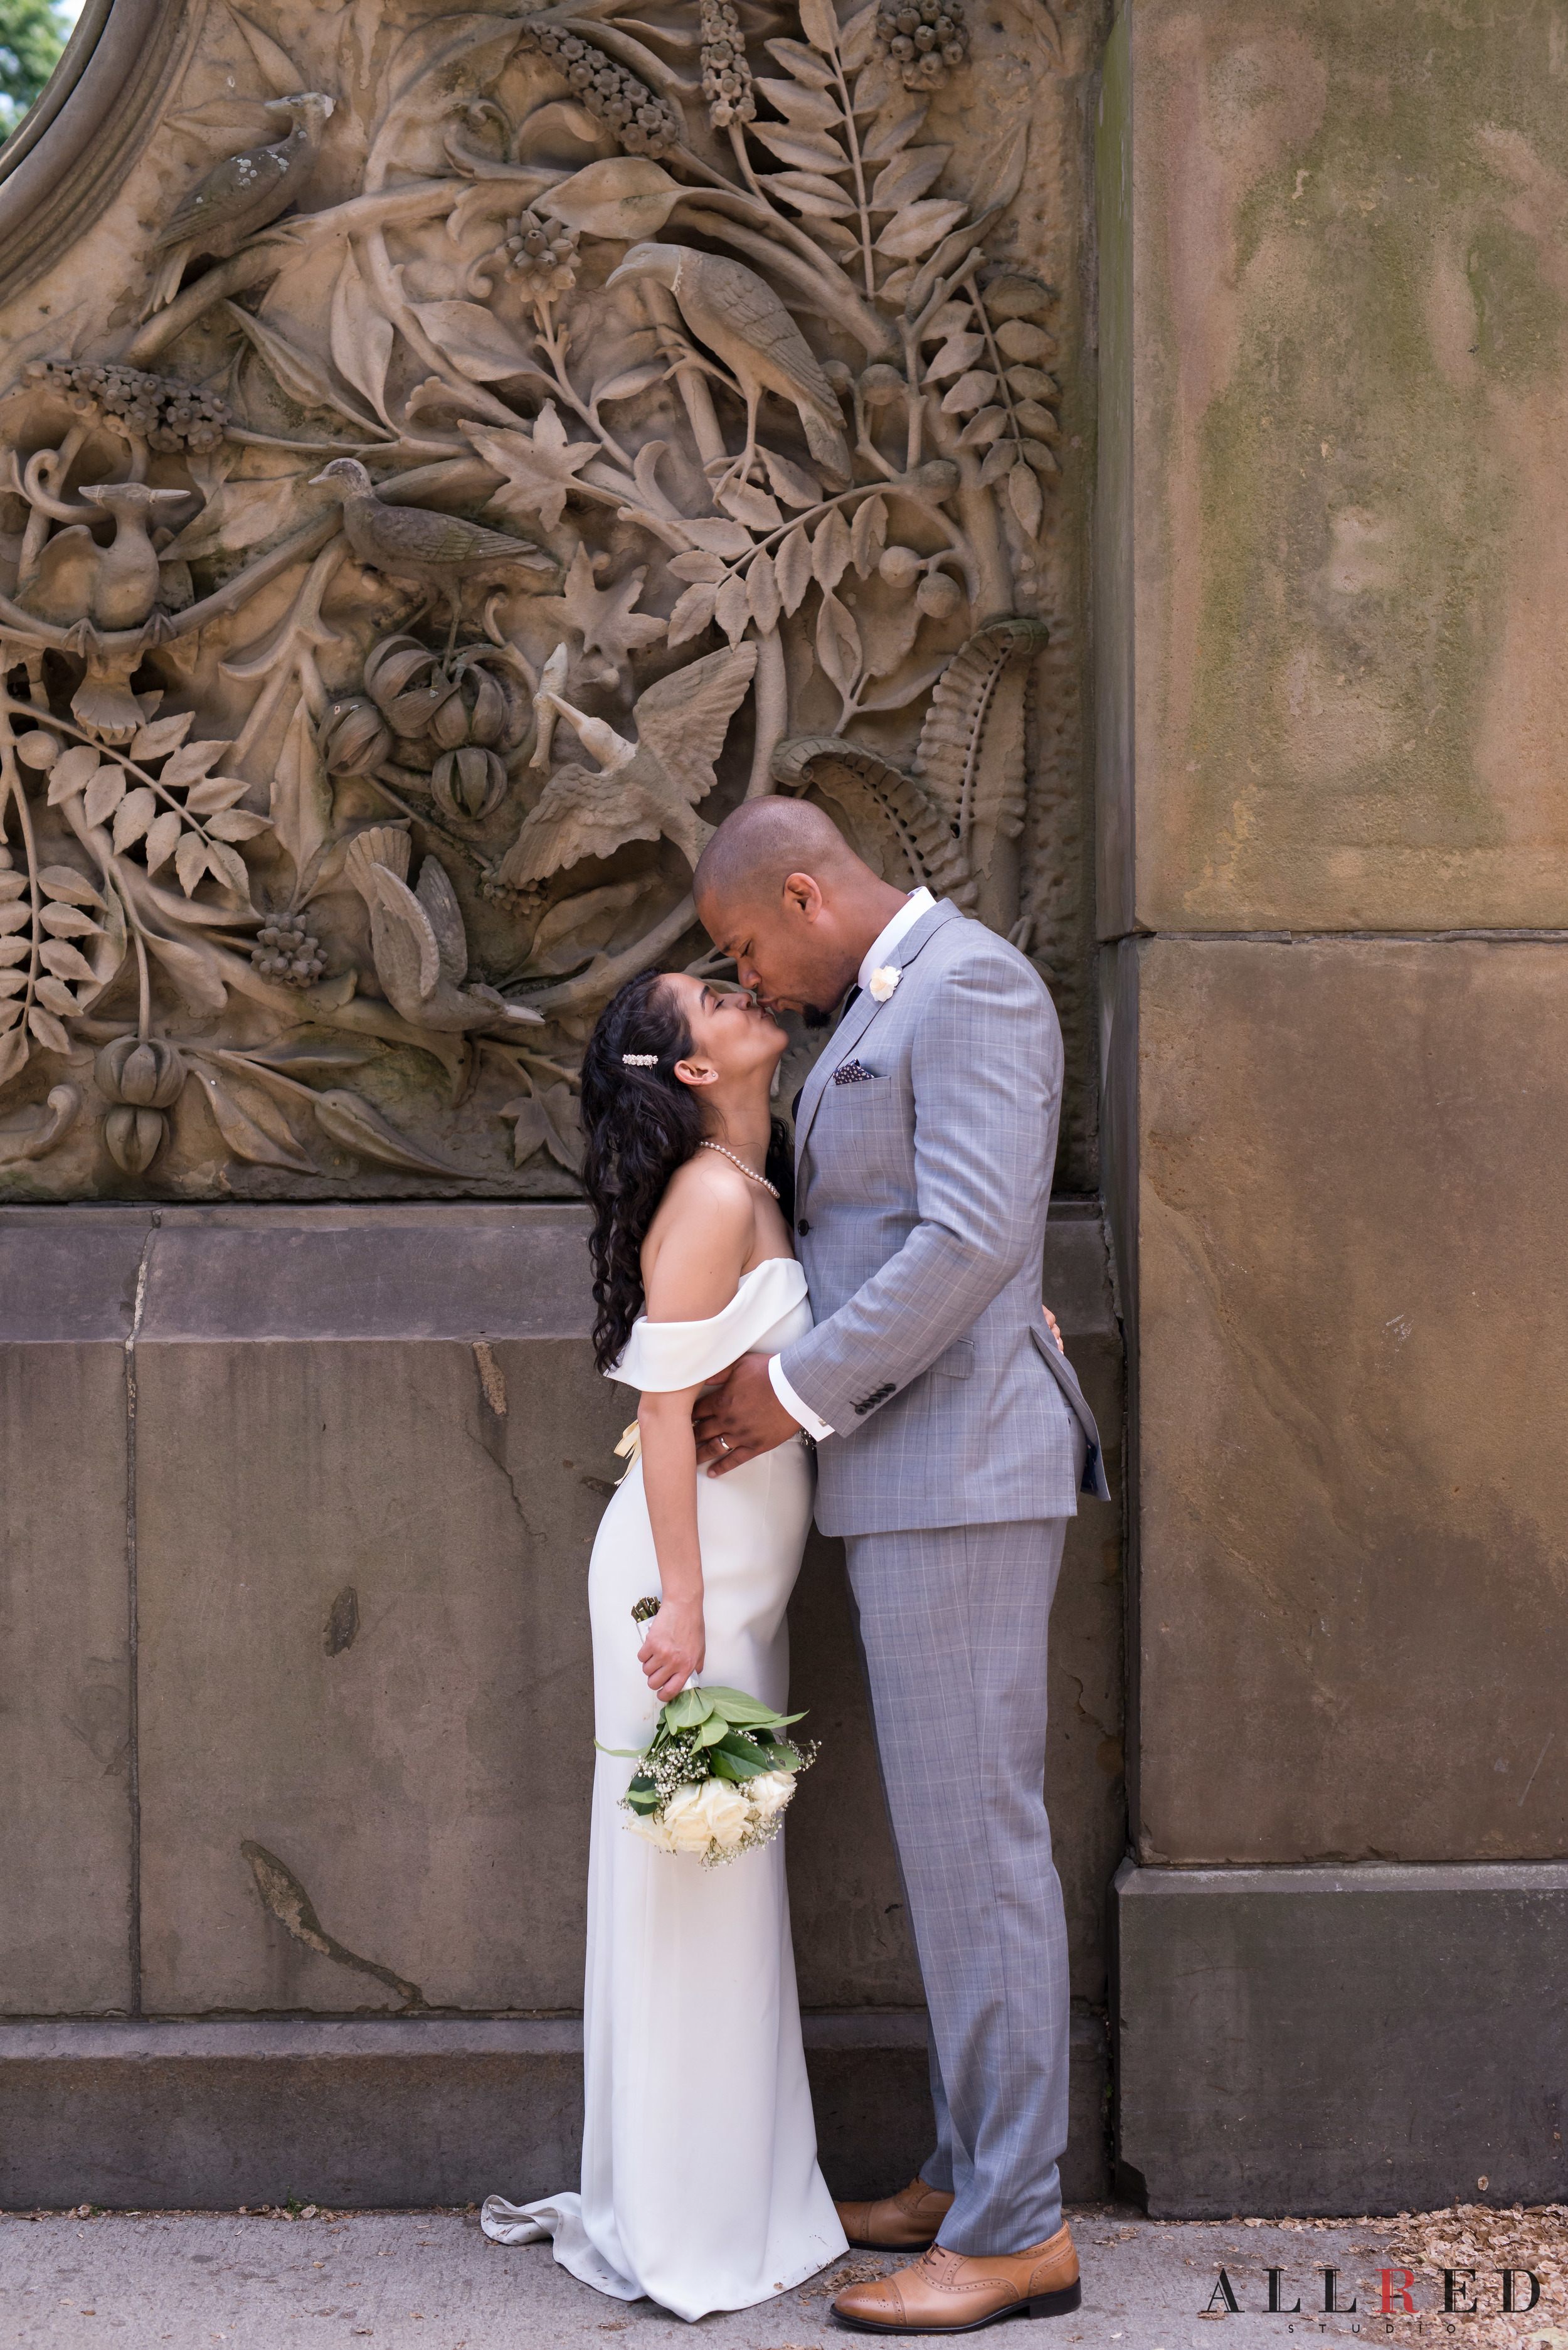 Wedding-central-park-allred-studio-new-york-photographer-new-jersey-hudson-valley-2738.jpg